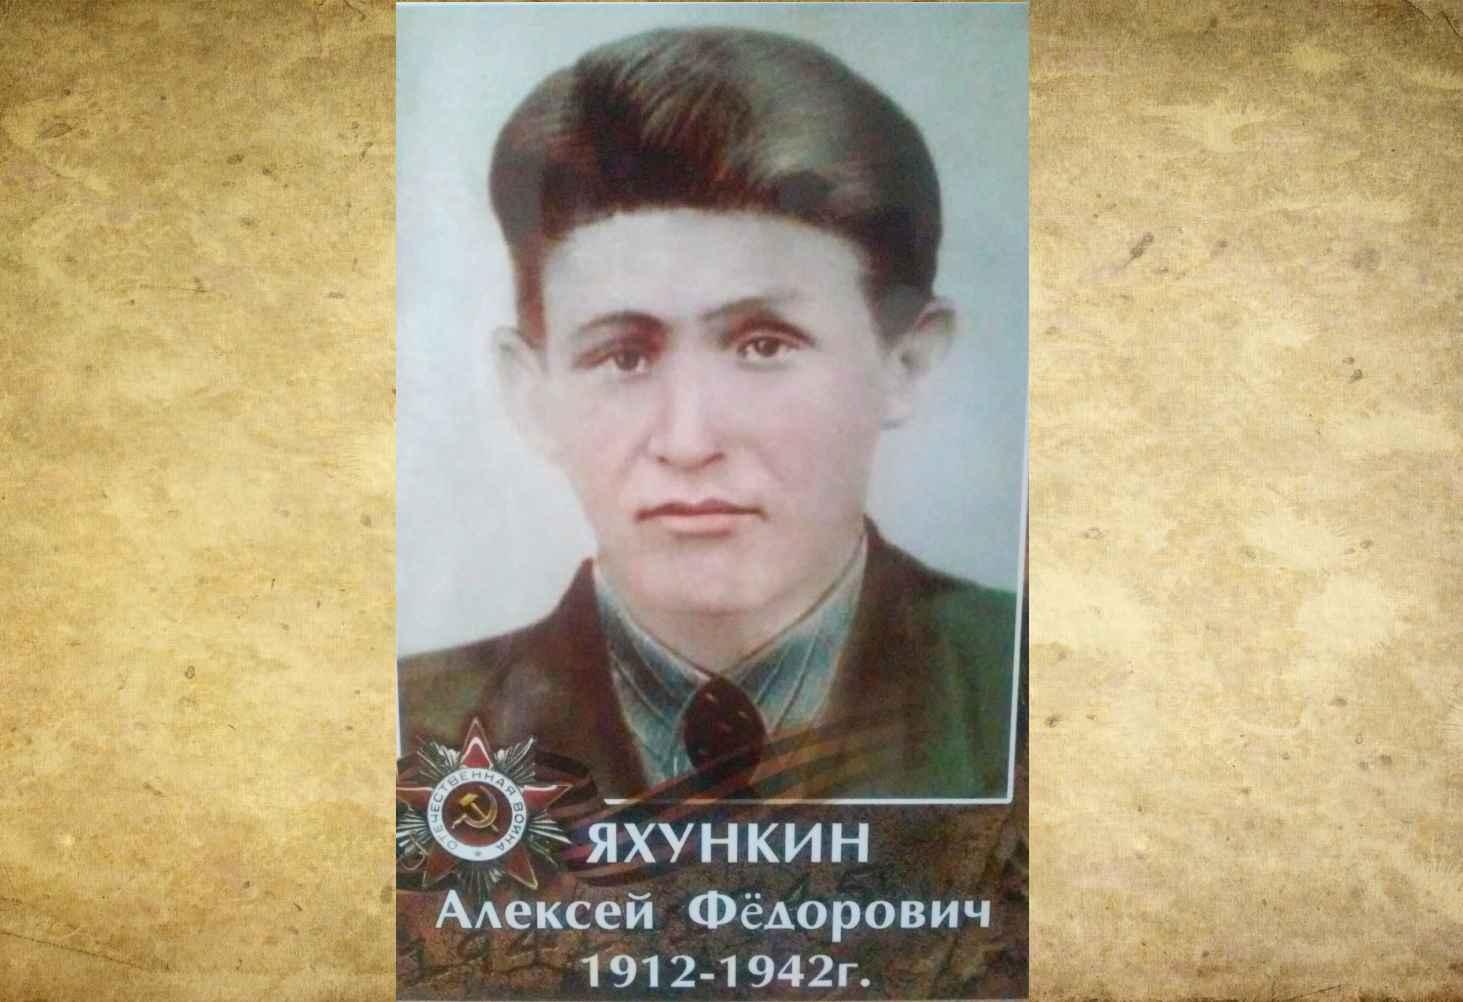 yahunkin-aleksej-fedorovich